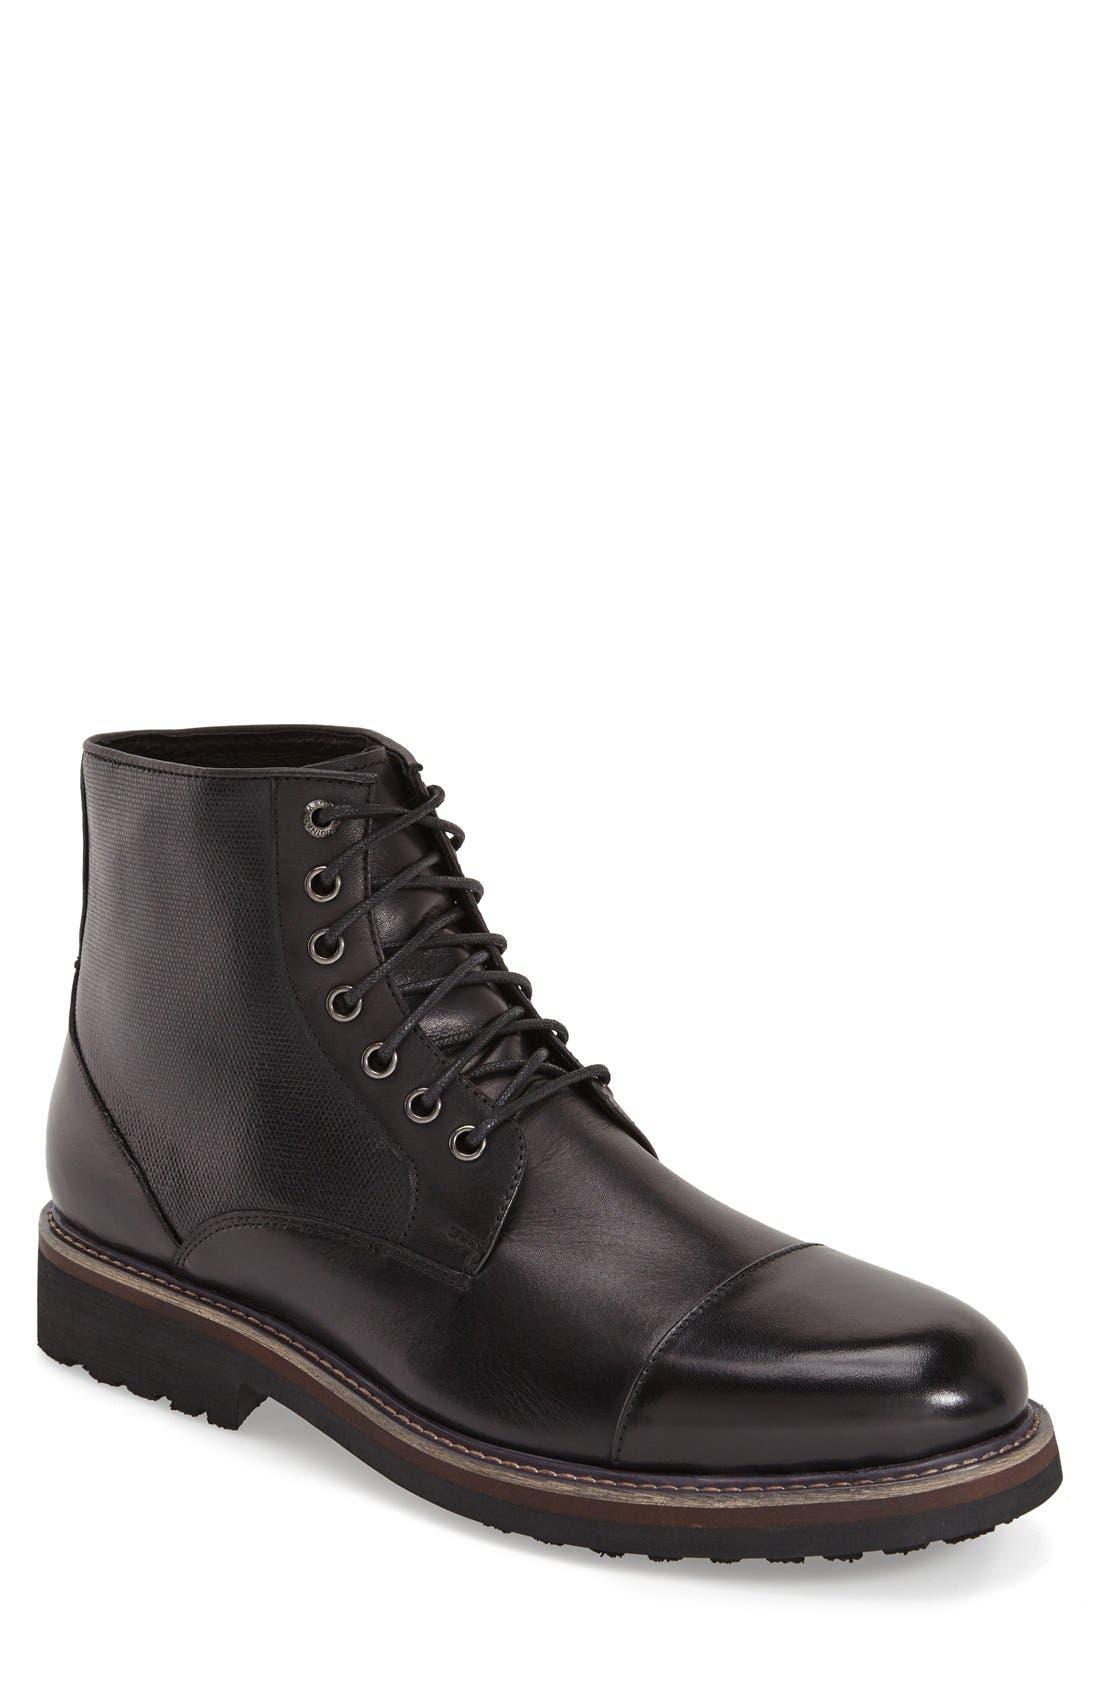 'Northstar' Cap Toe Boot,                         Main,                         color, 001